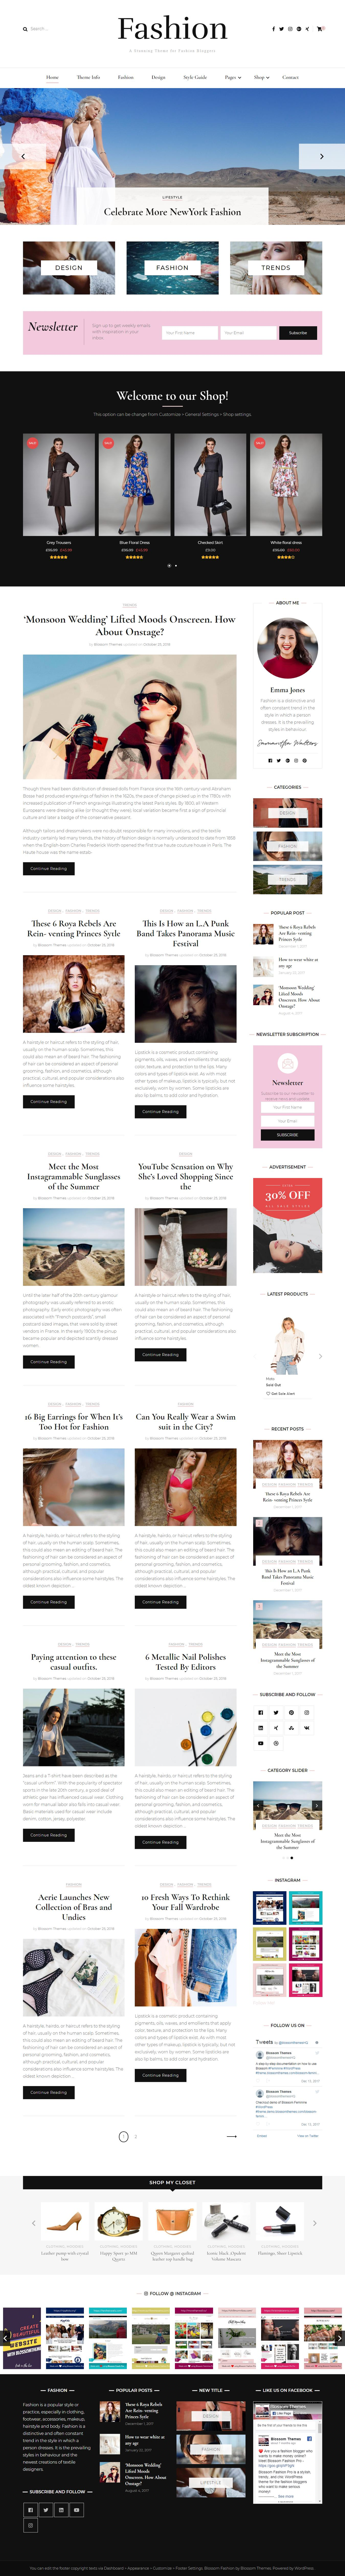 Blossom Fashion - El mejor tema gratuito de WordPress sobre moda